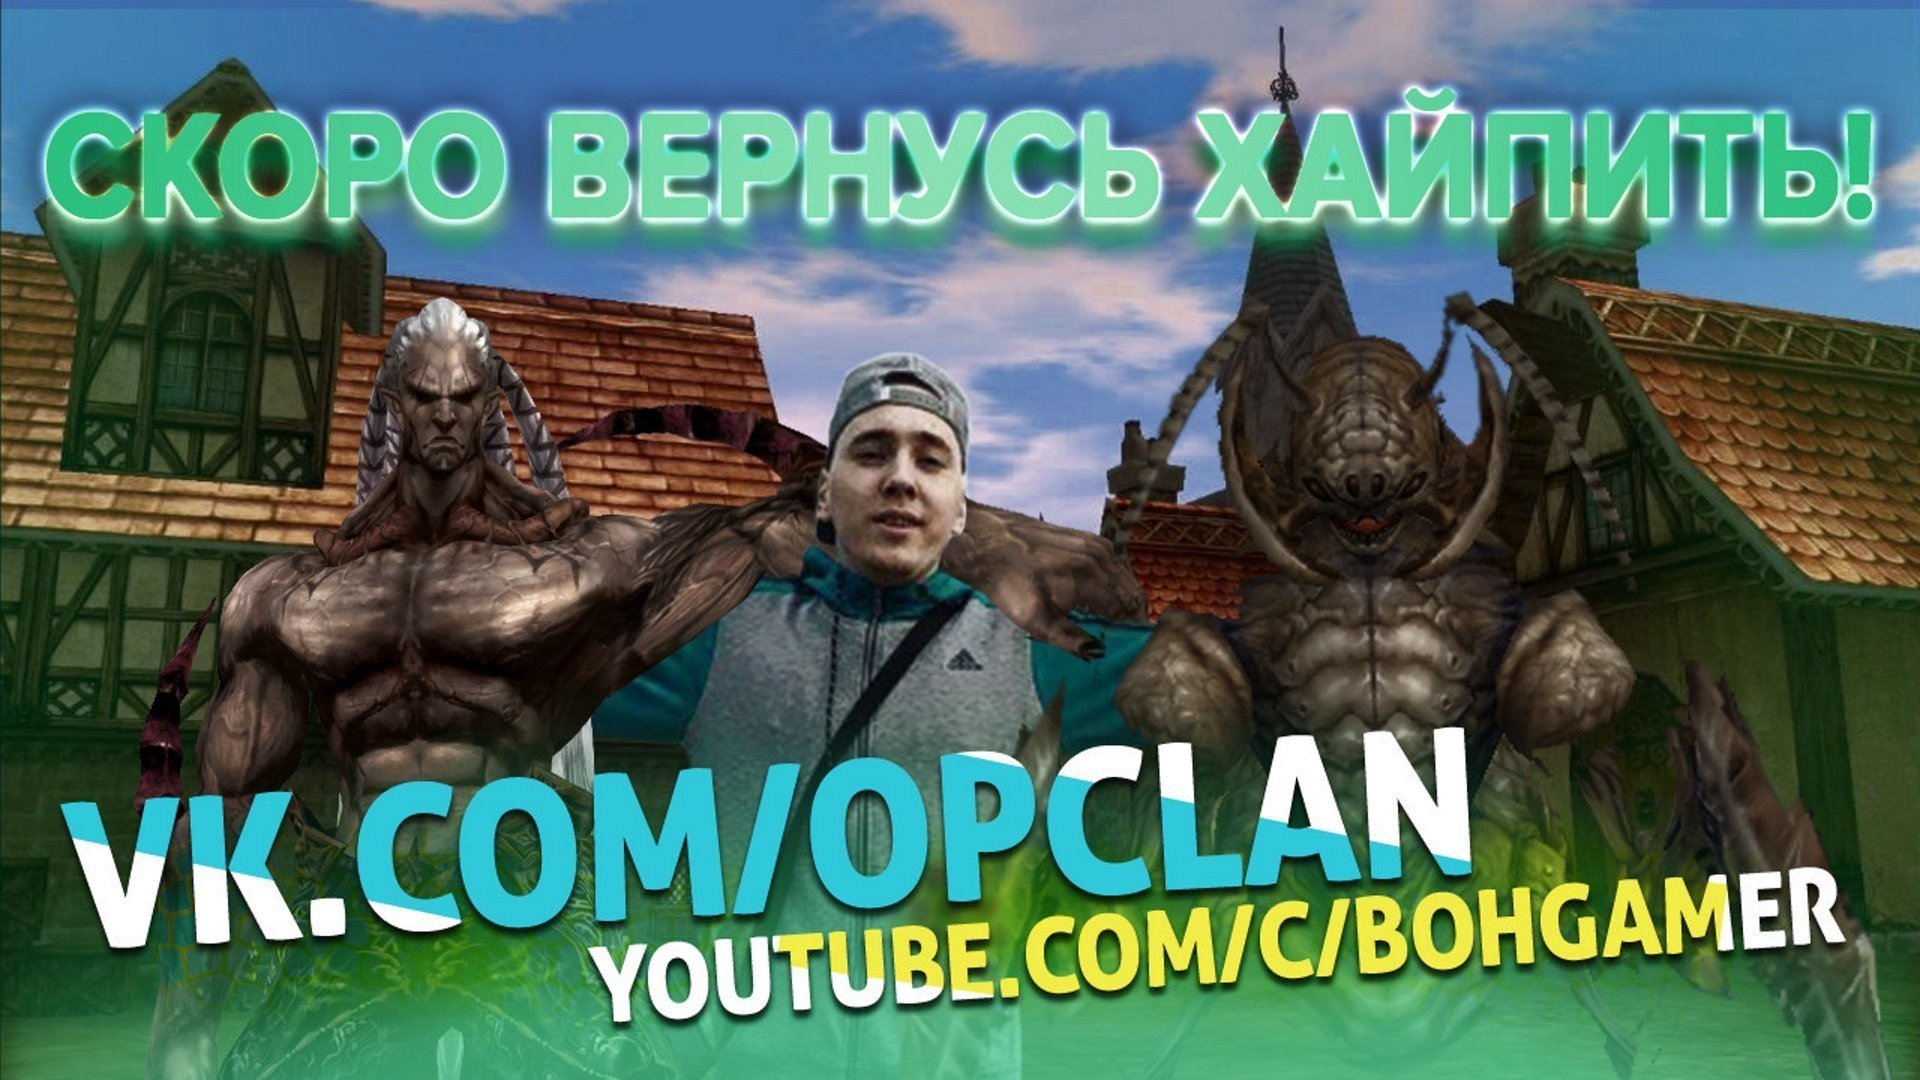 bohjeka video banner